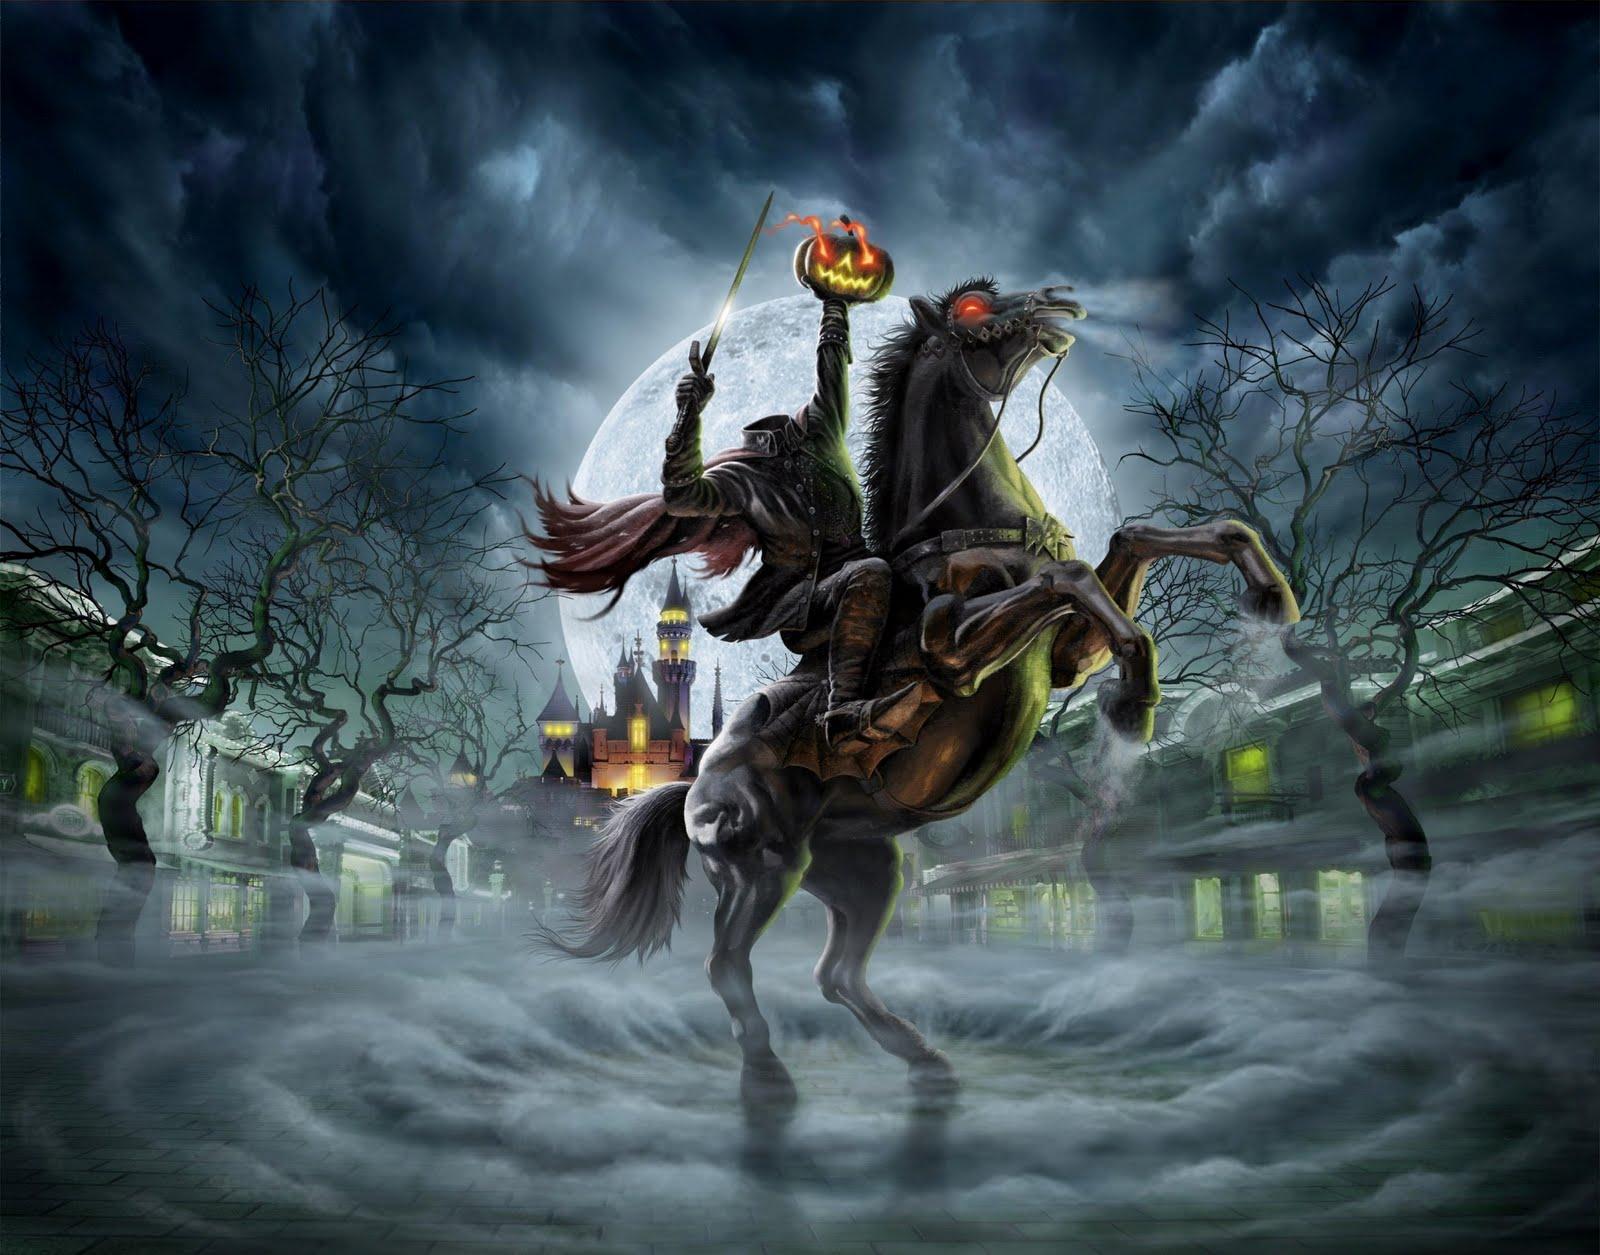 Headless horseman villains wiki fandom powered by wikia - Pictures of the headless horseman ...